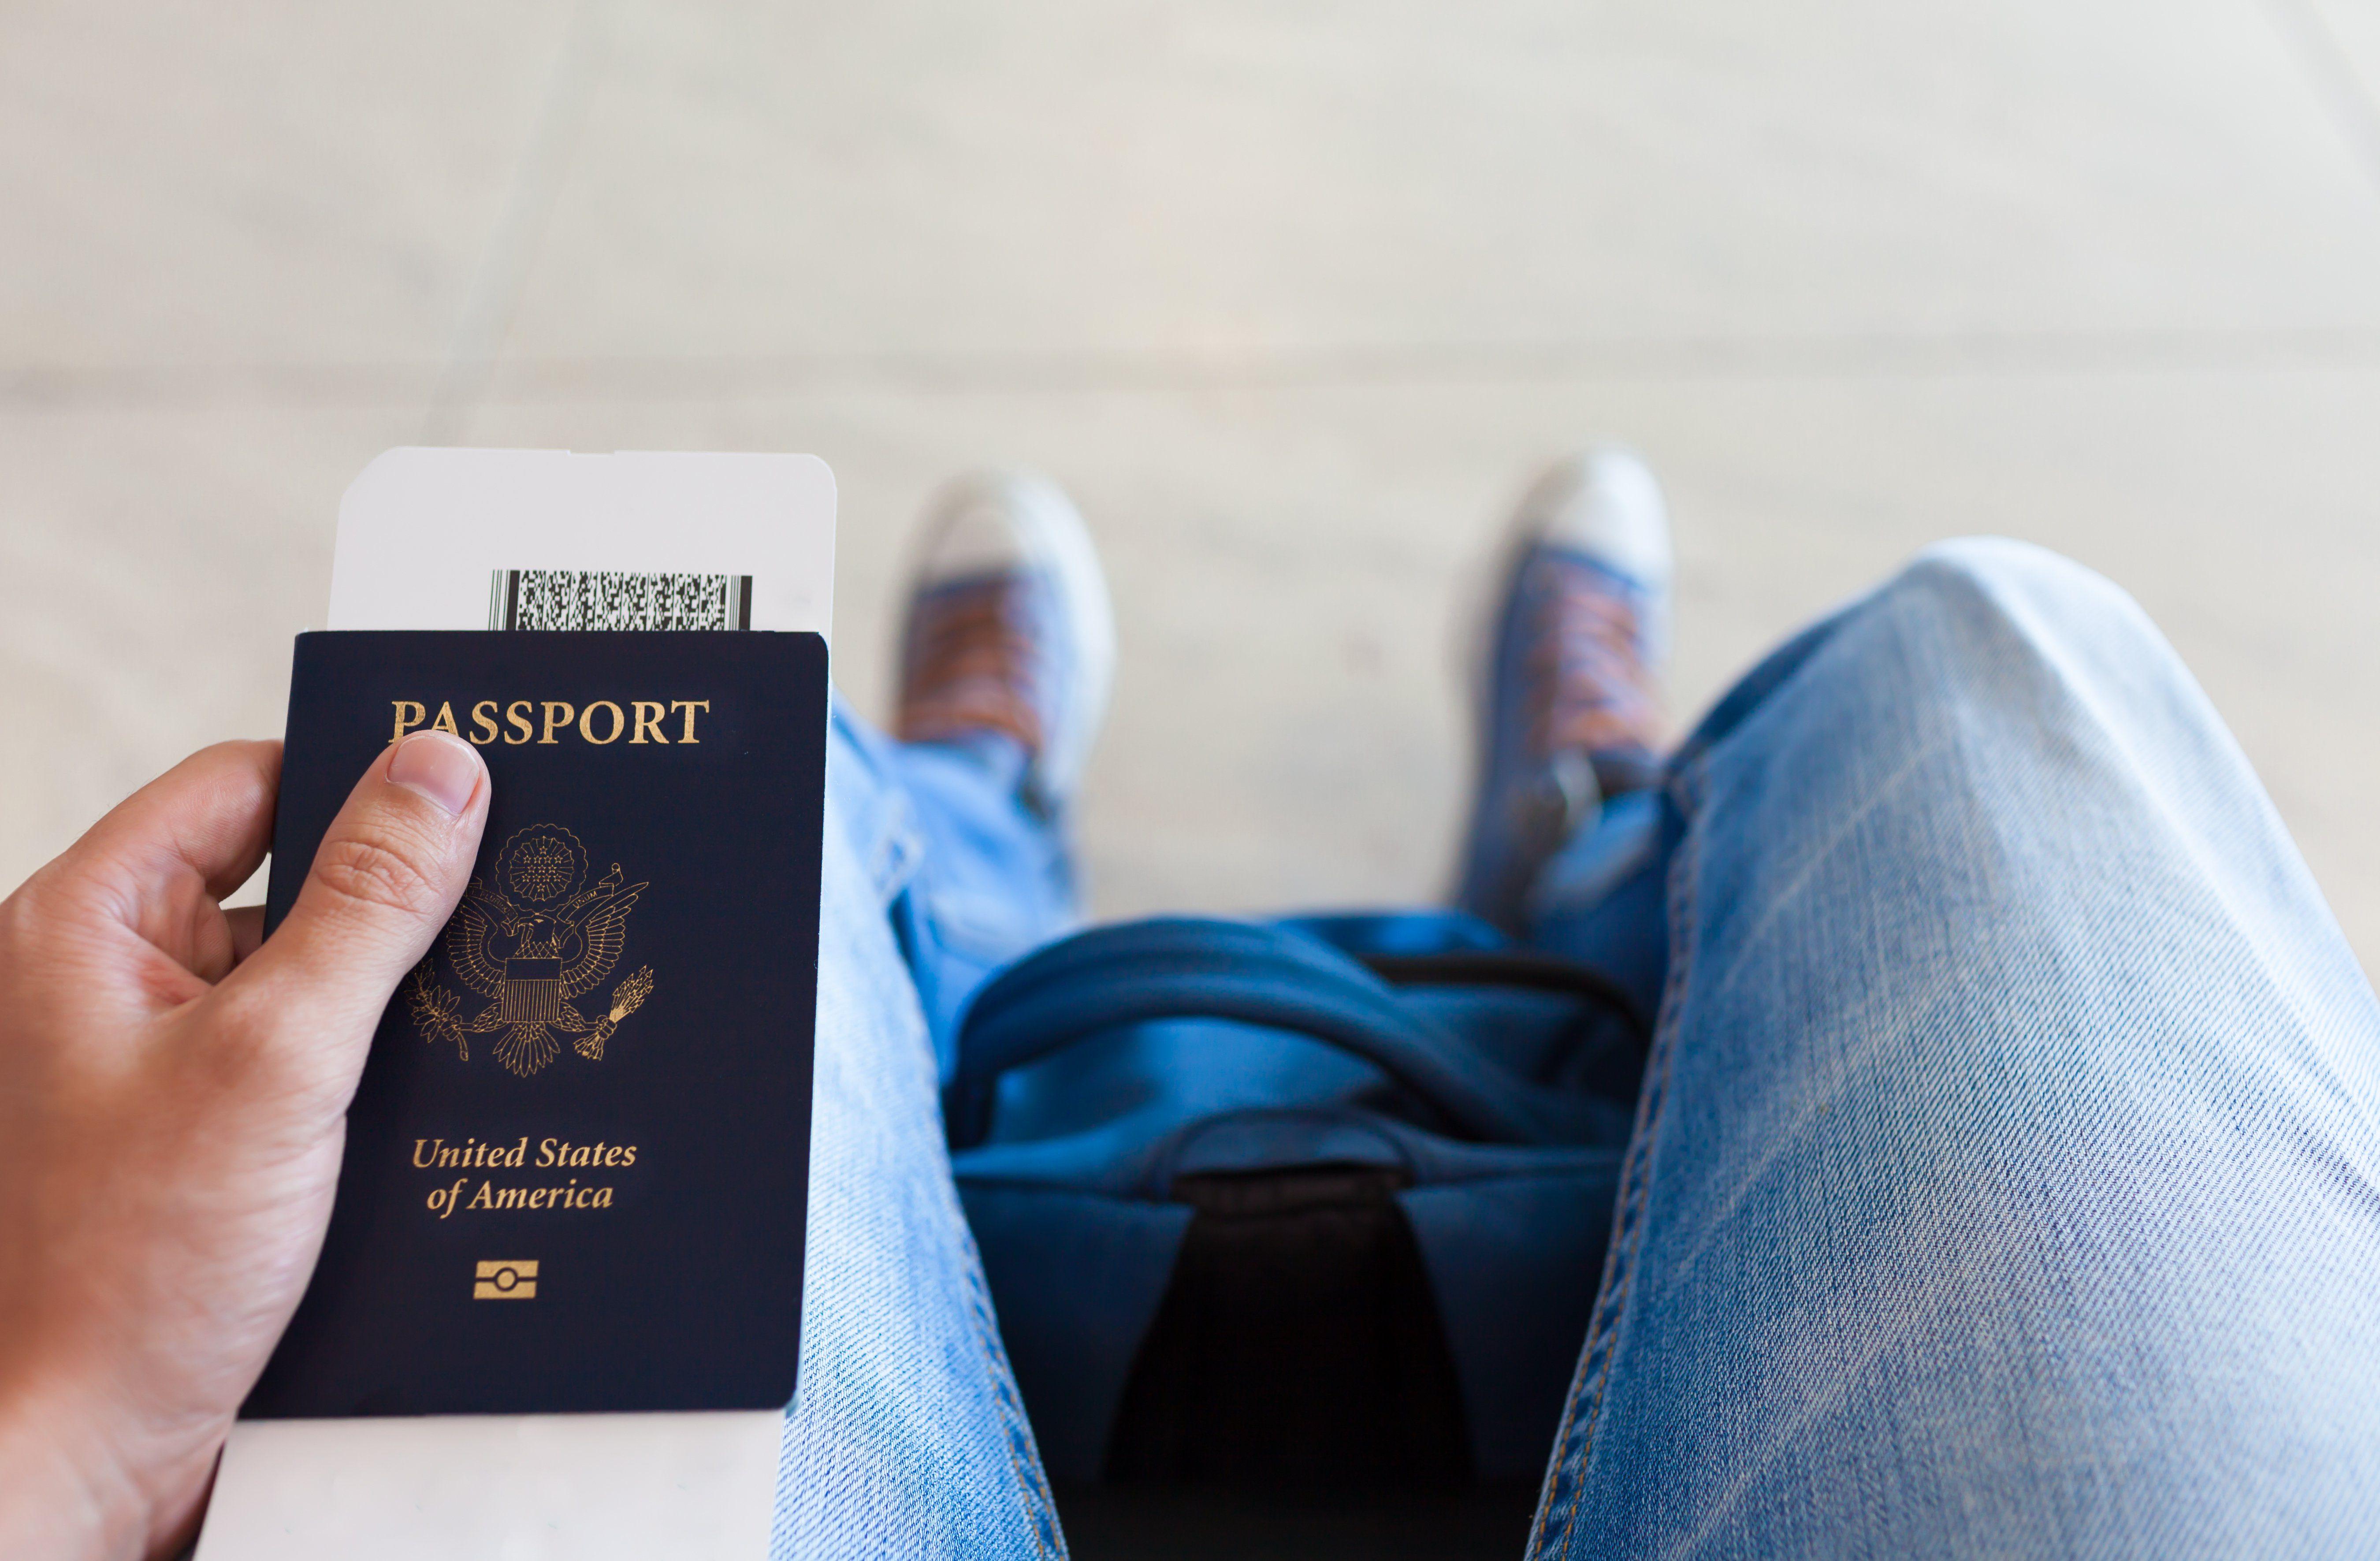 Man holding passport